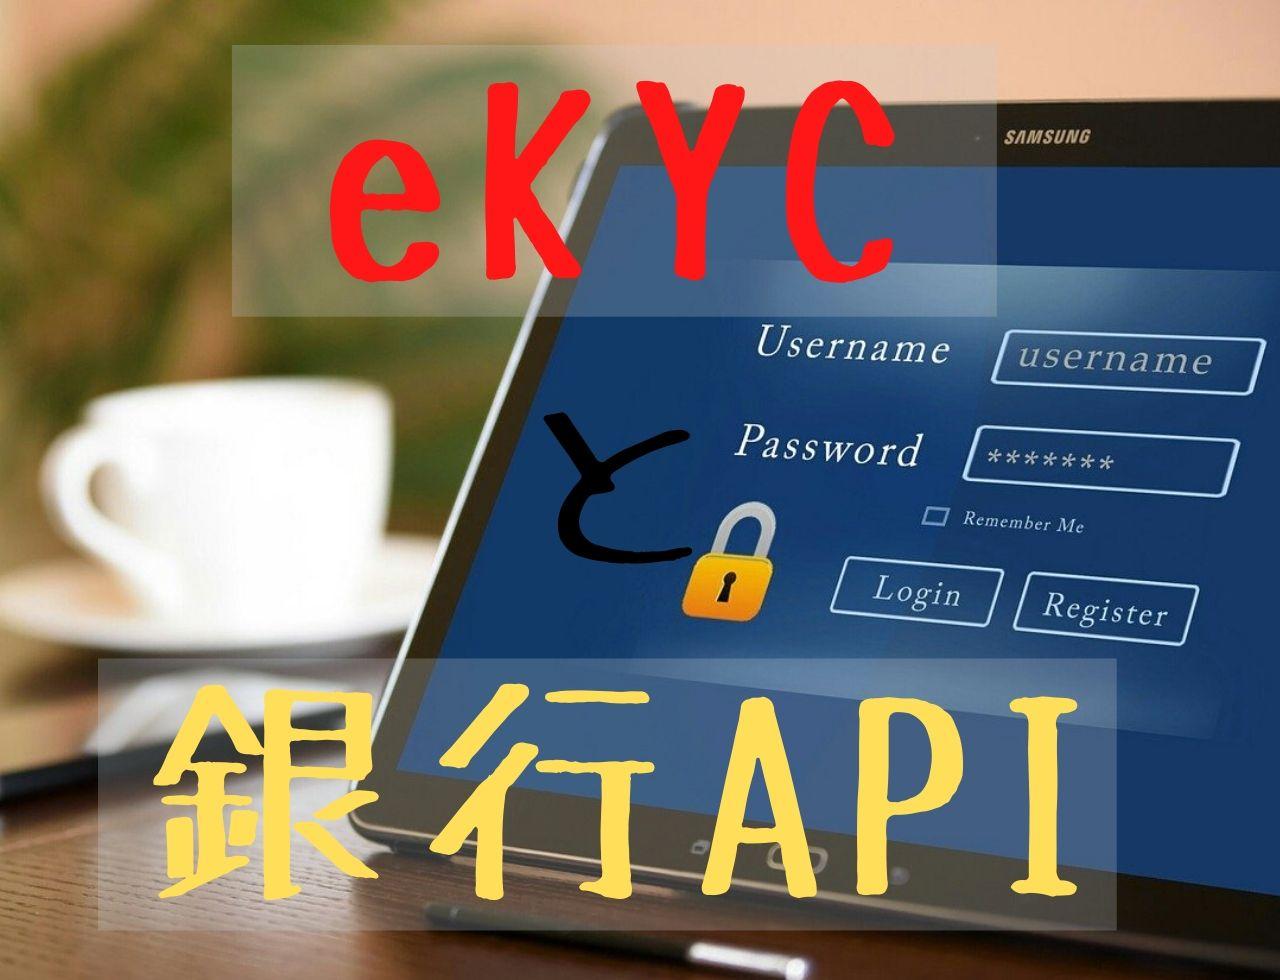 eKYCと銀行APIとは何か